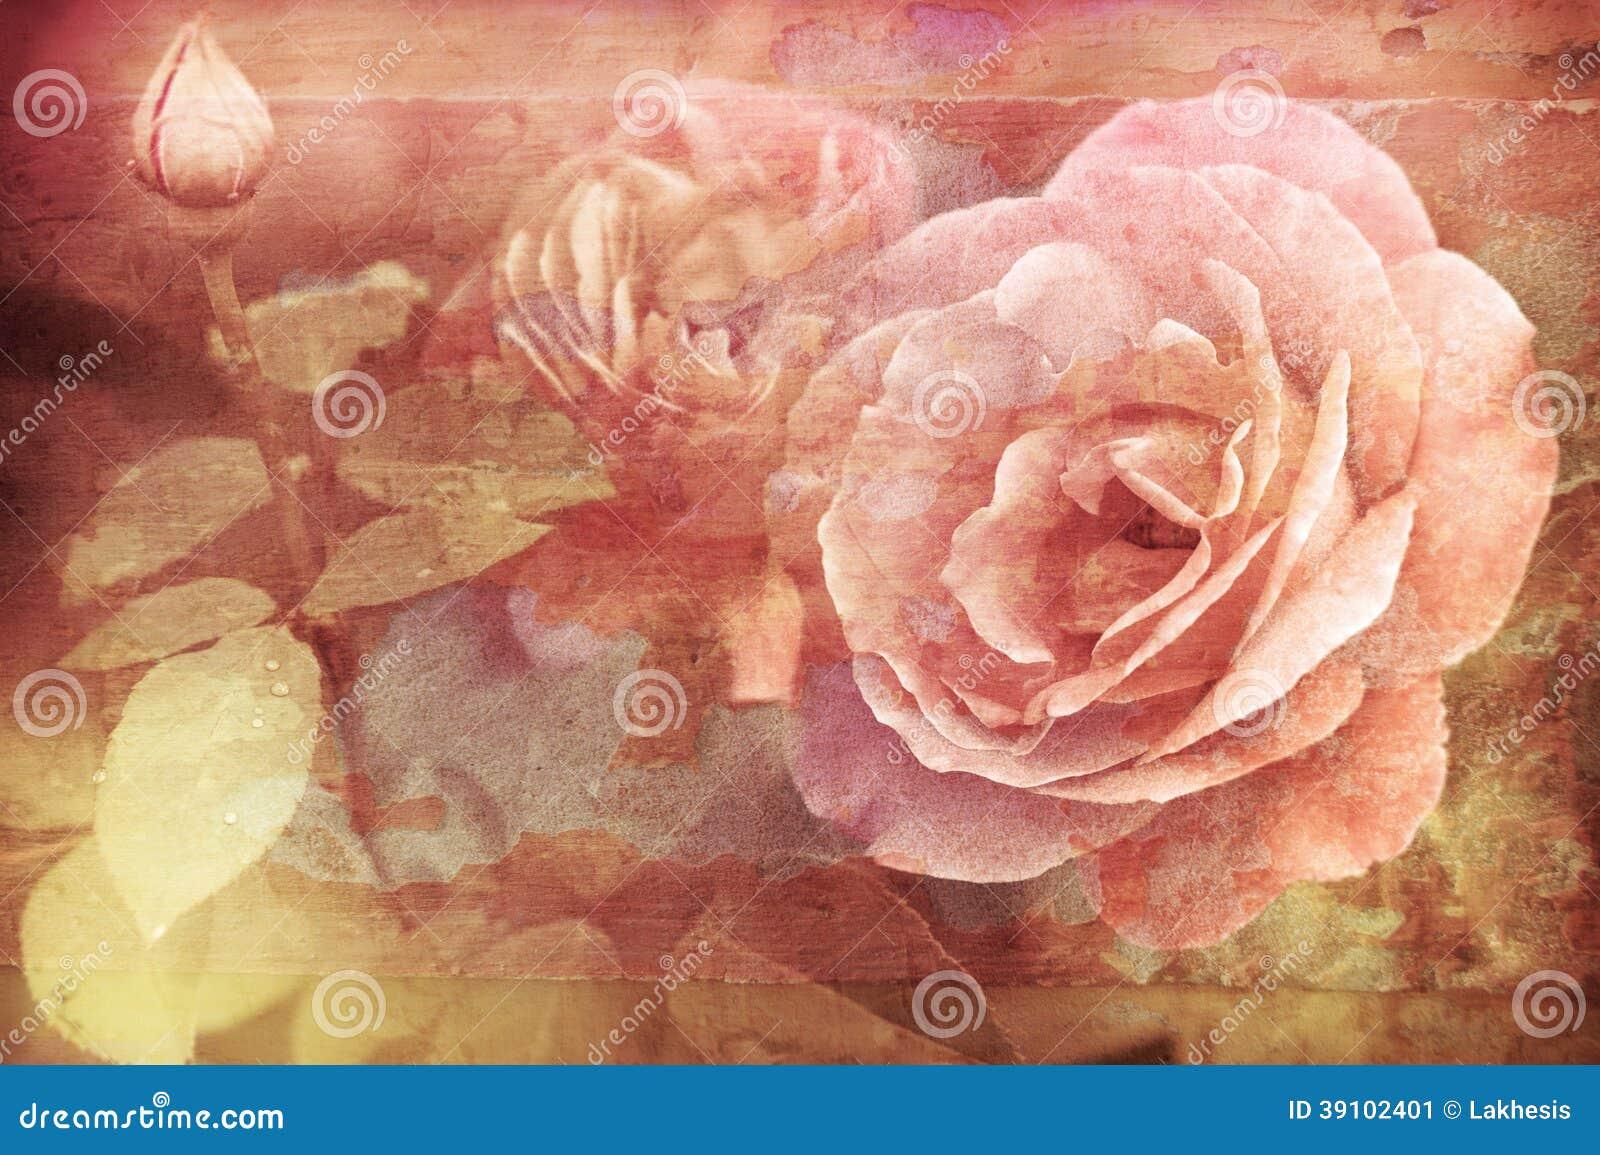 wallpaper roses gold